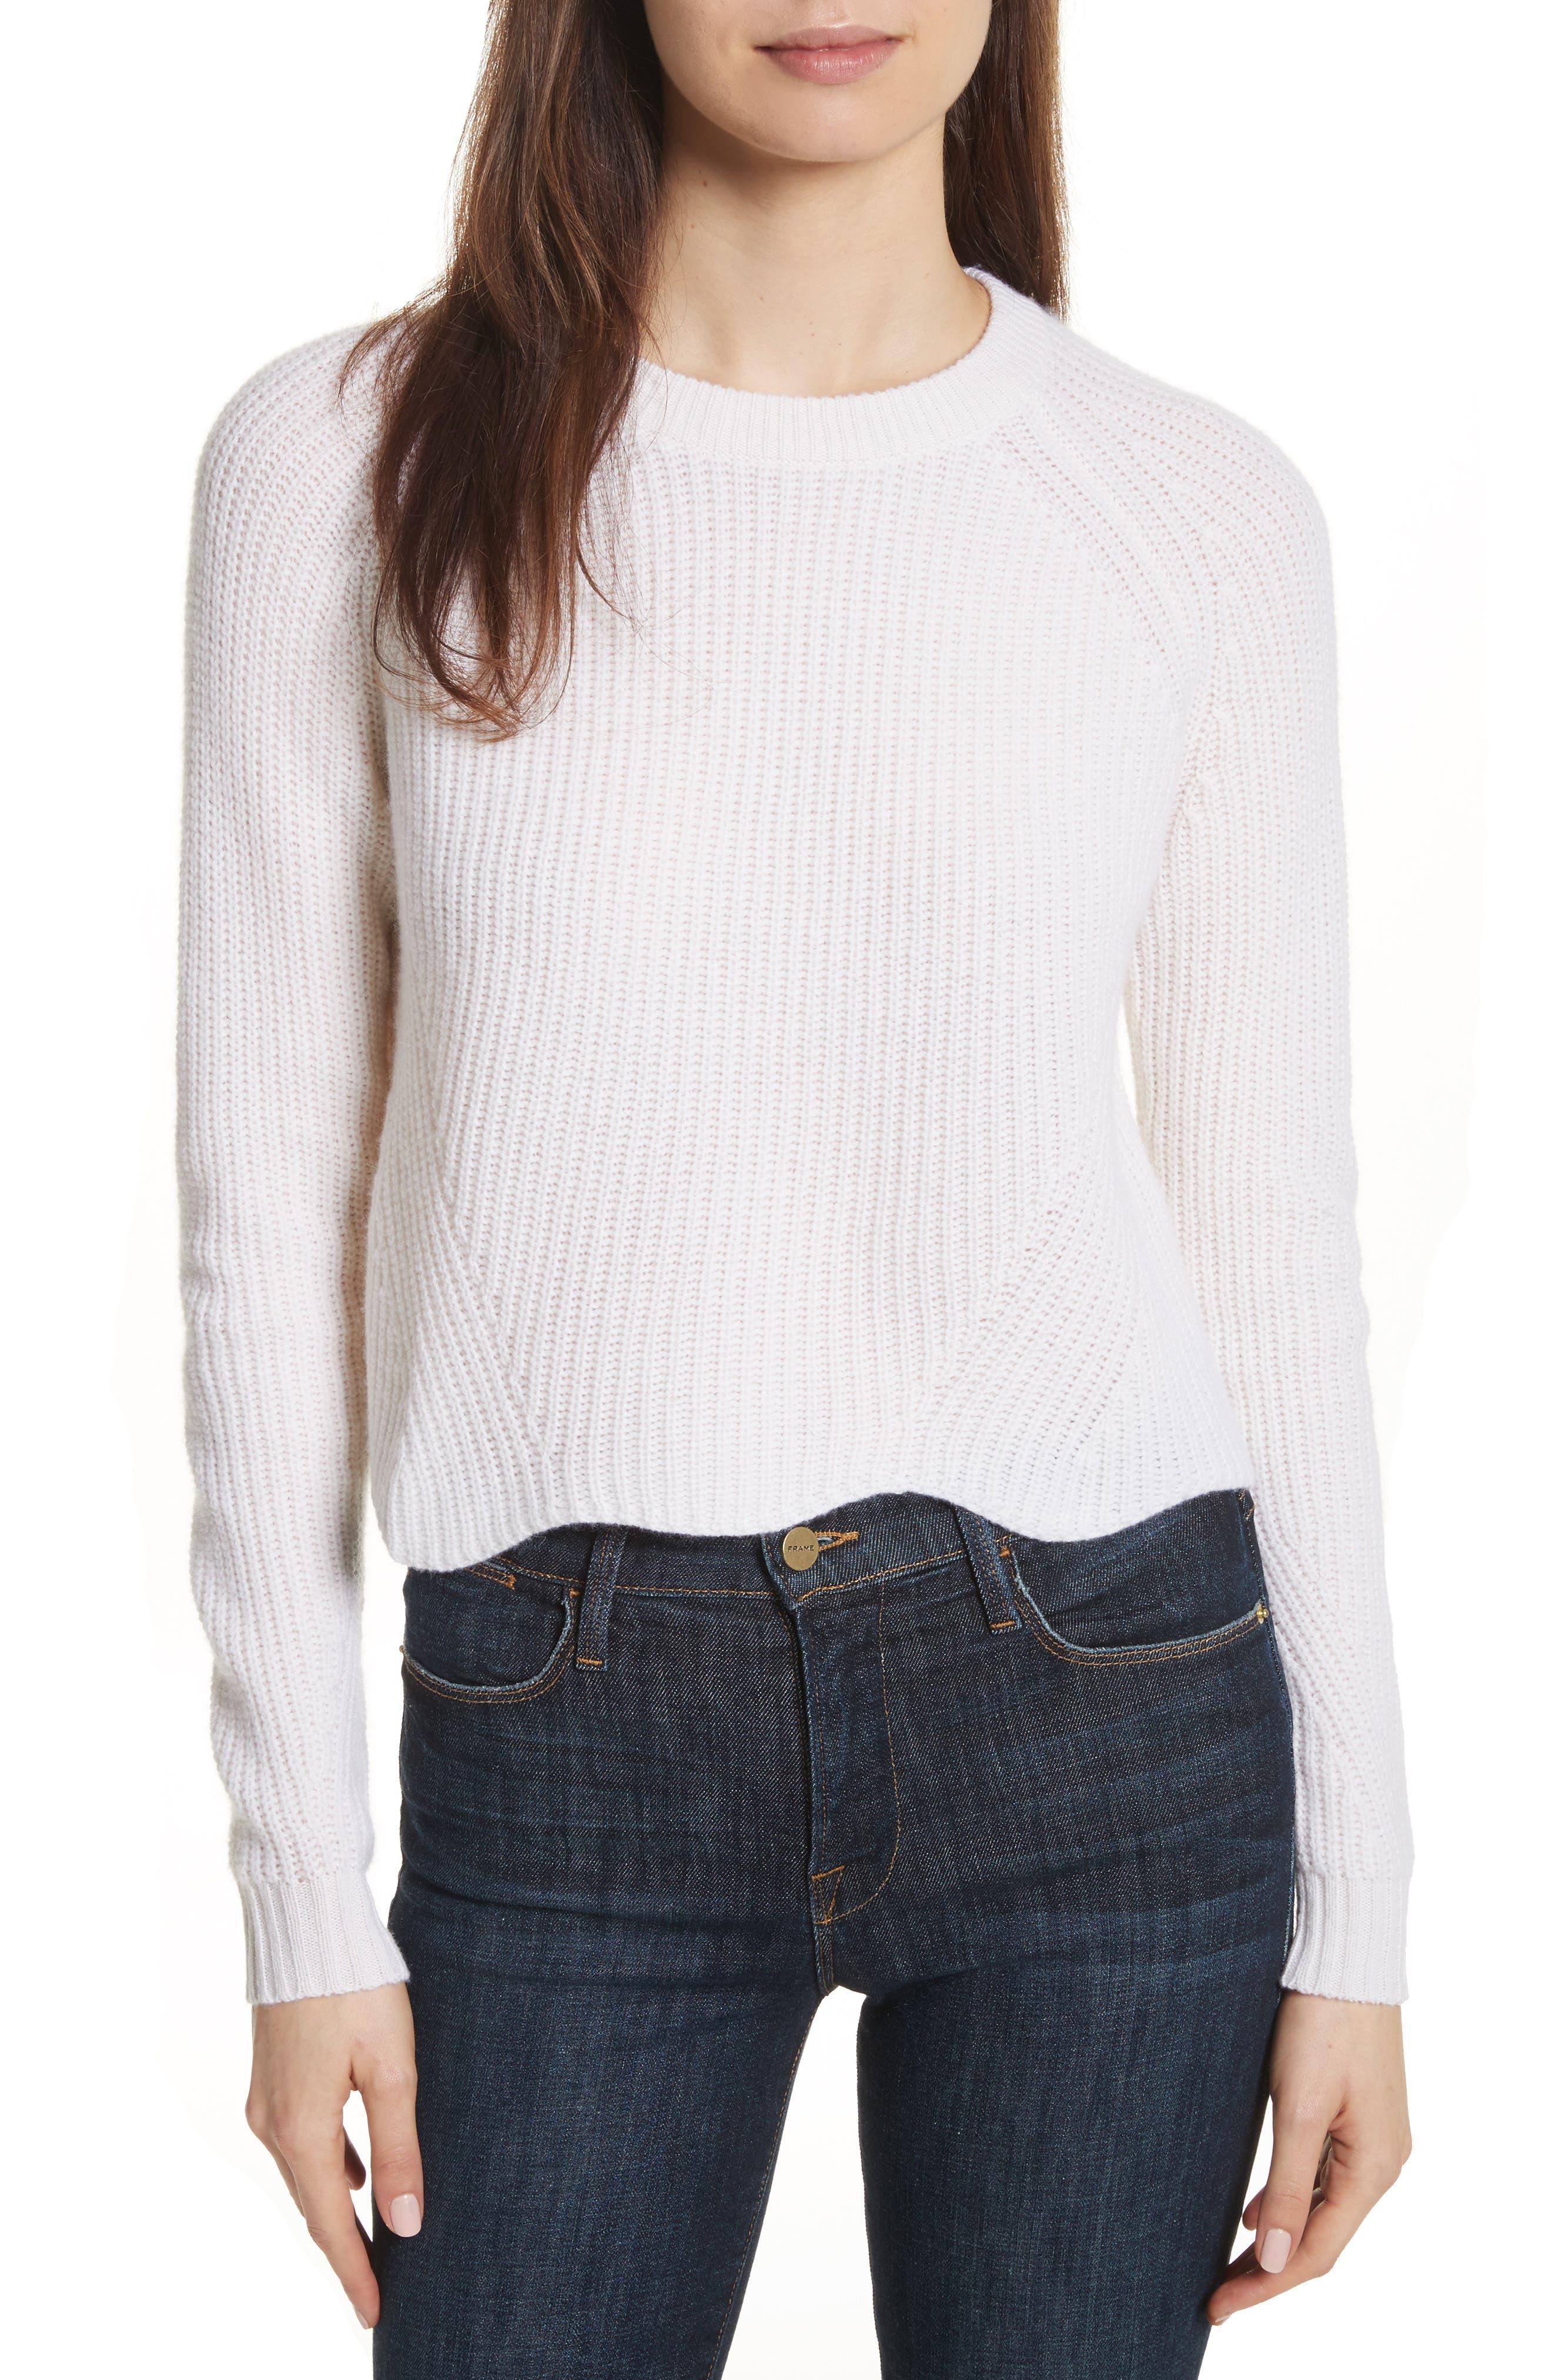 Main Image - autumn cashmere Cashmere Scalloped Shaker Sweater